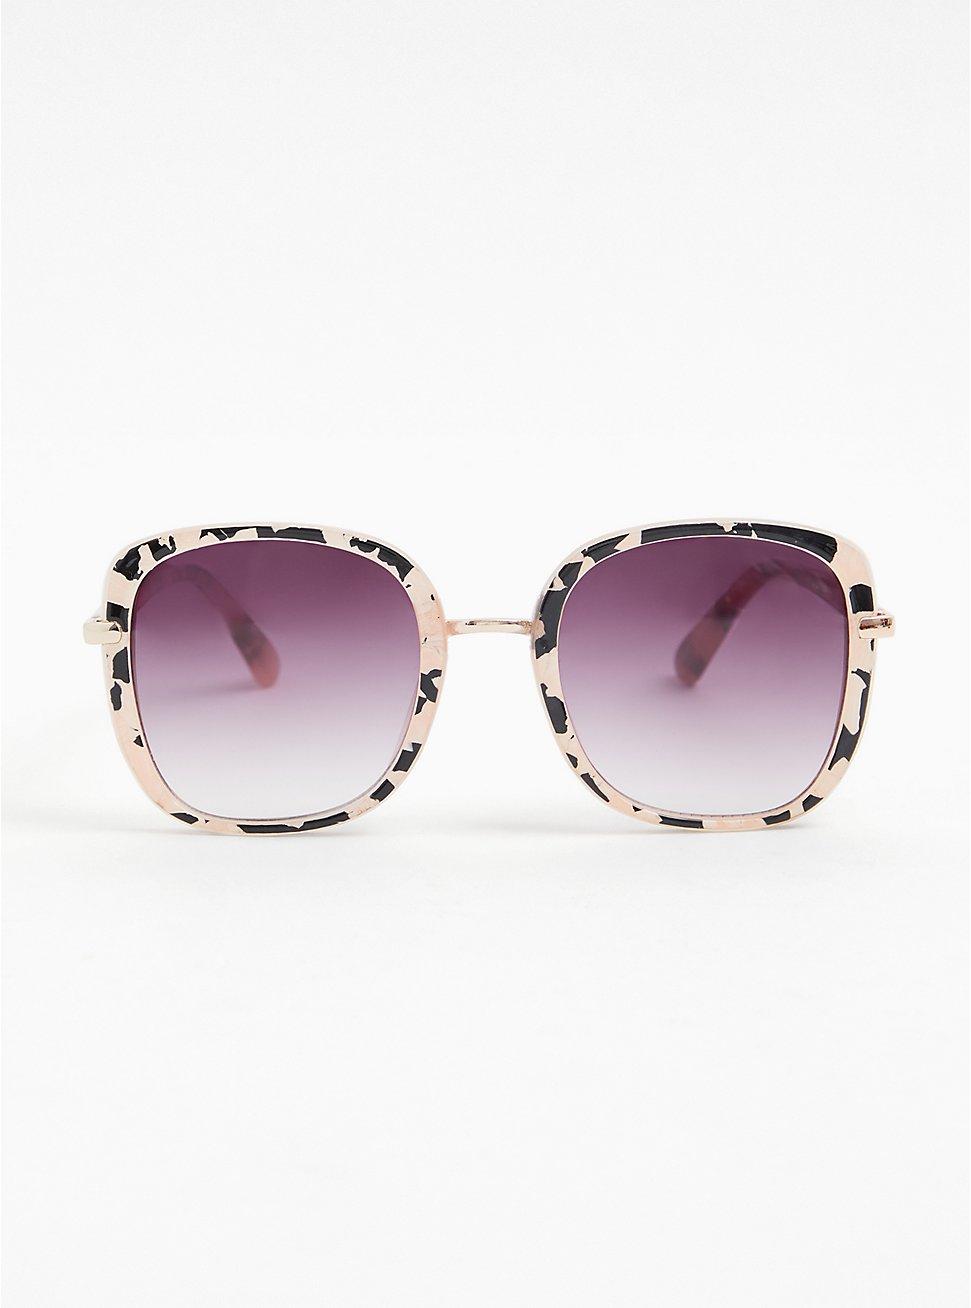 Plus Size Blush Pink & Black Speckled Square Sunglasses, , hi-res